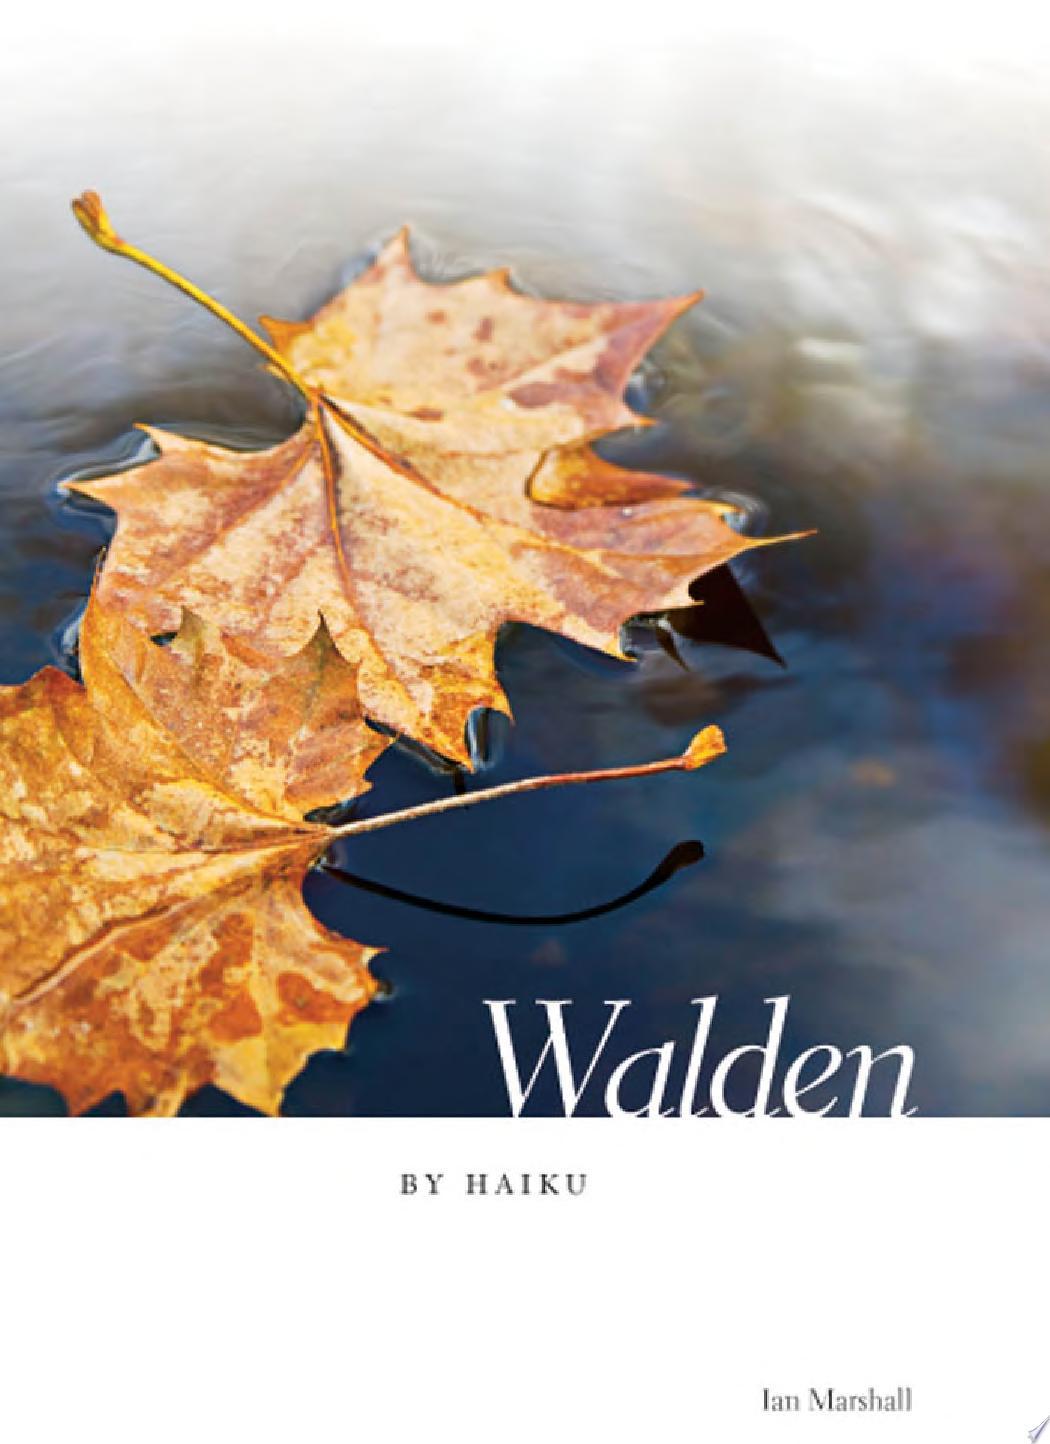 Walden by Haiku